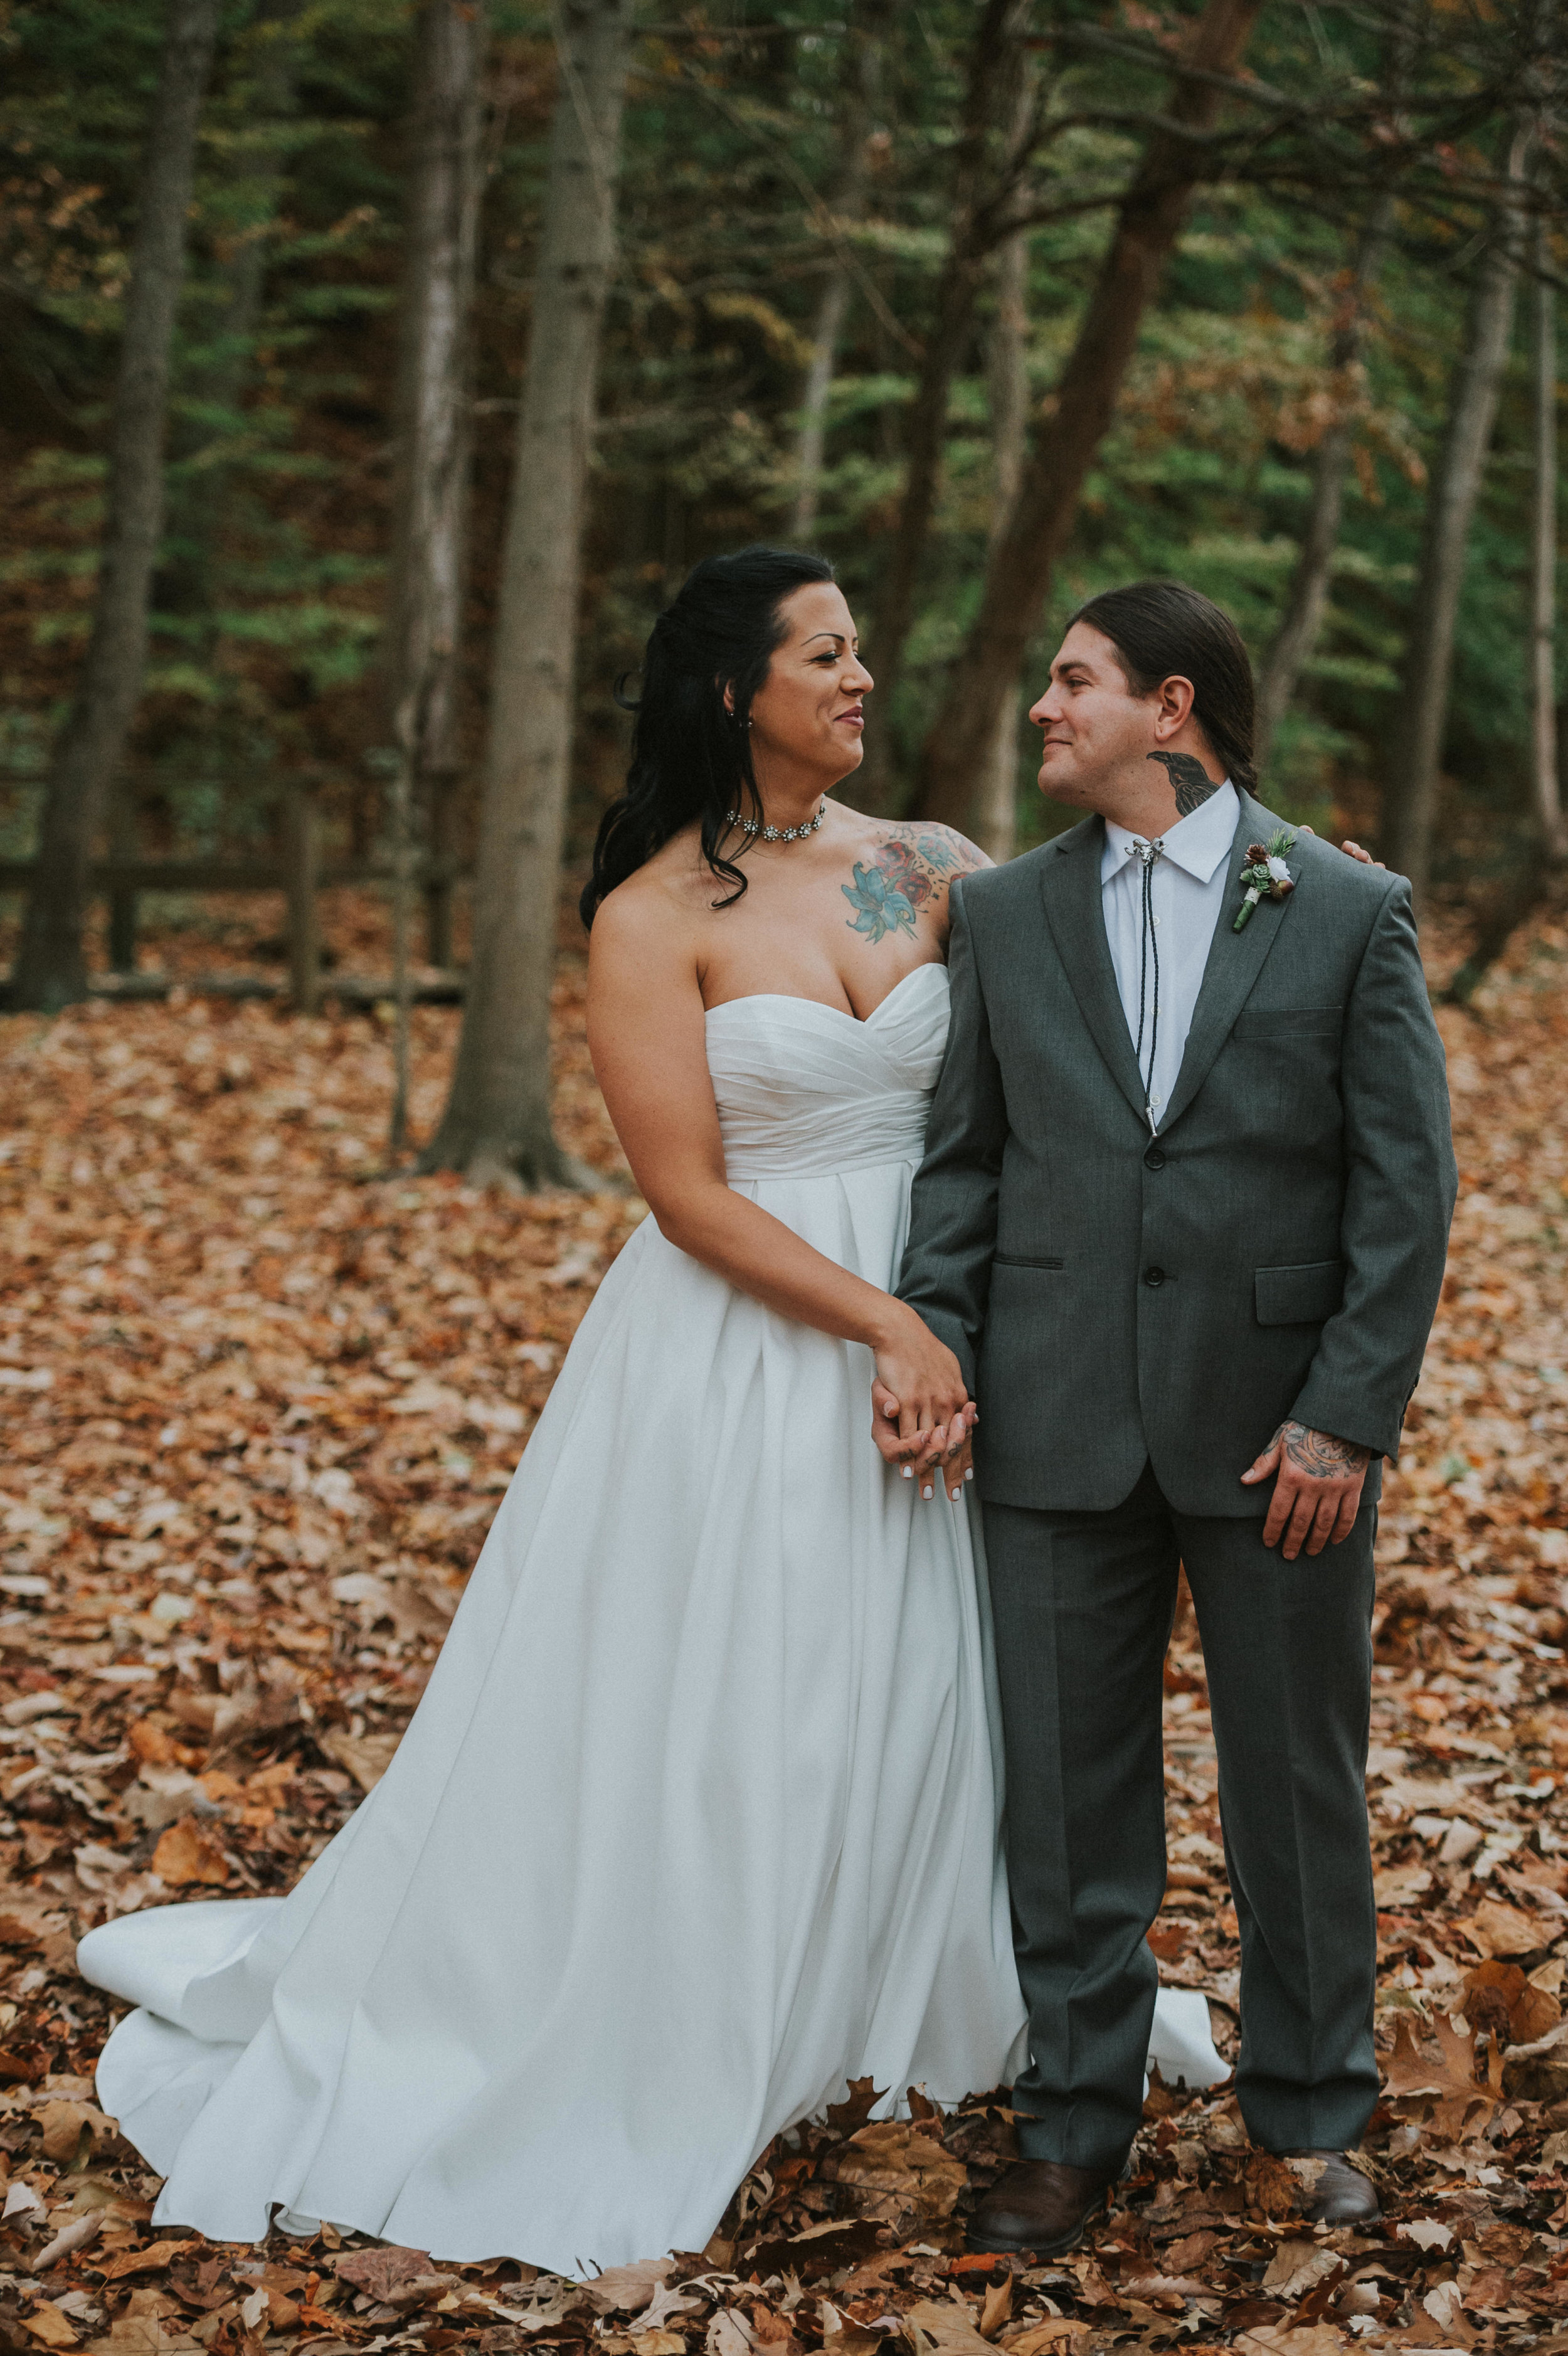 Rodes-Barn-Wedding-Mackenzie-and-Dylan-146.jpg